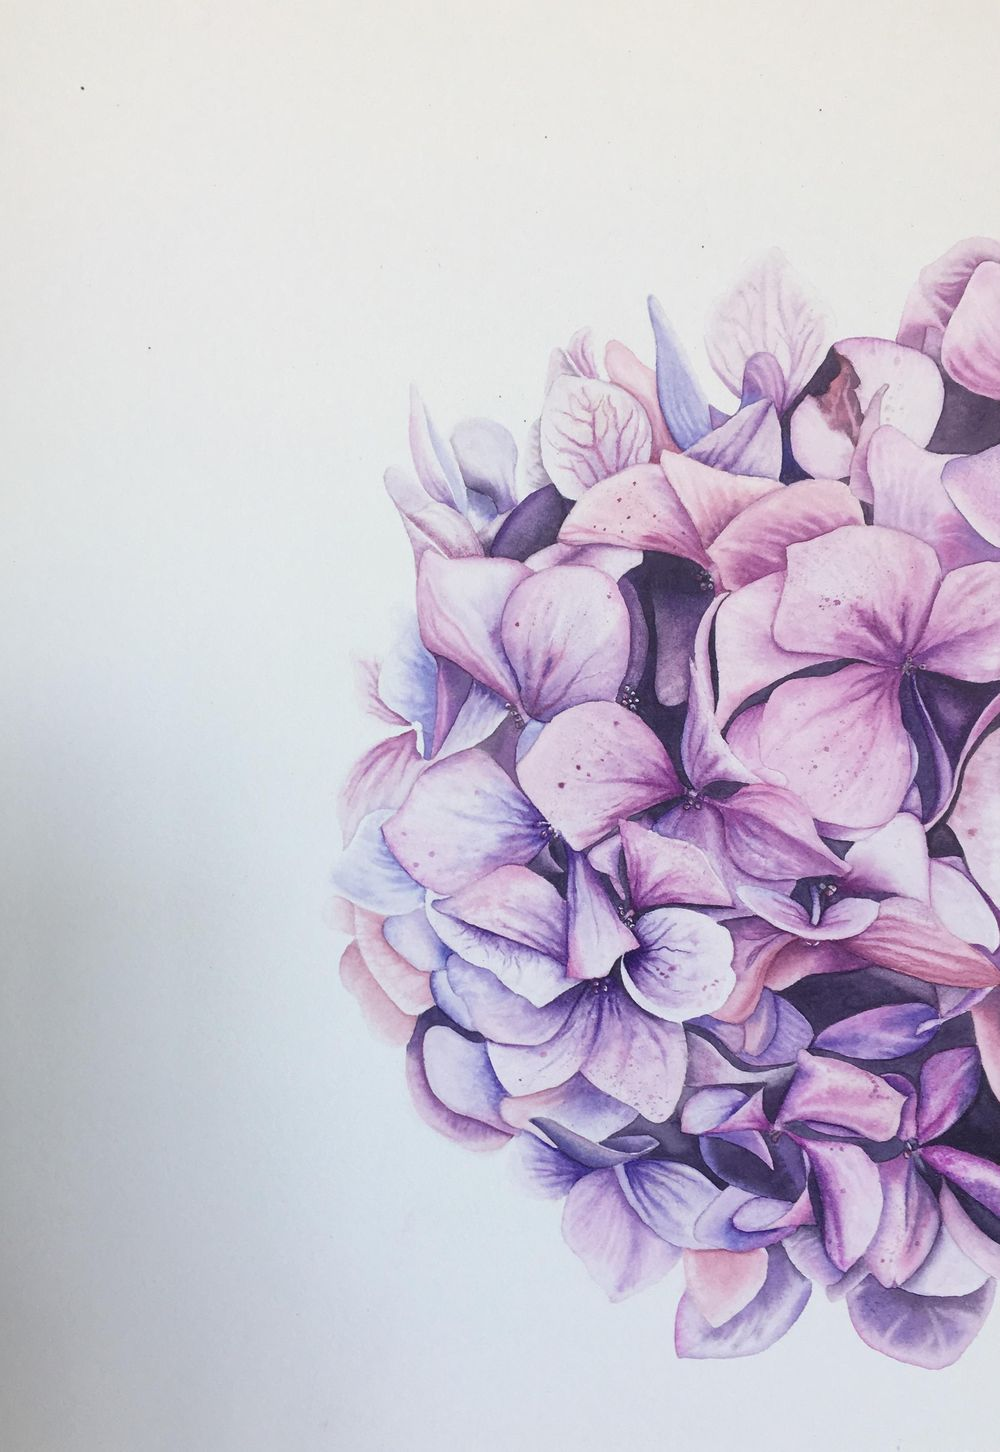 My Hydrangea - image 2 - student project